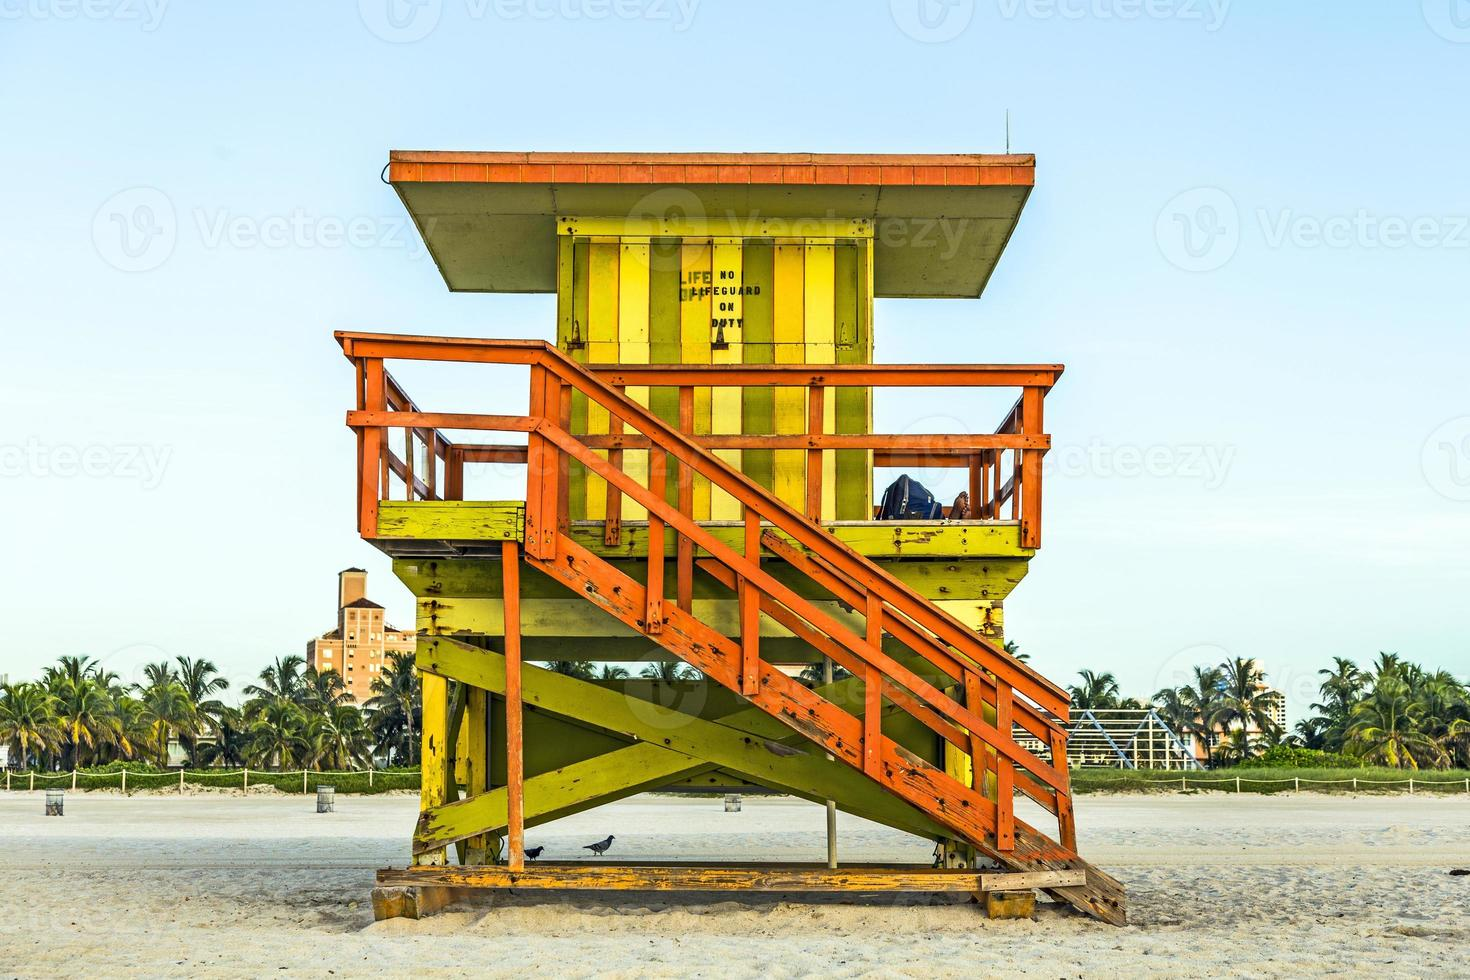 life guard toren op South Beach, Miami, Florida foto